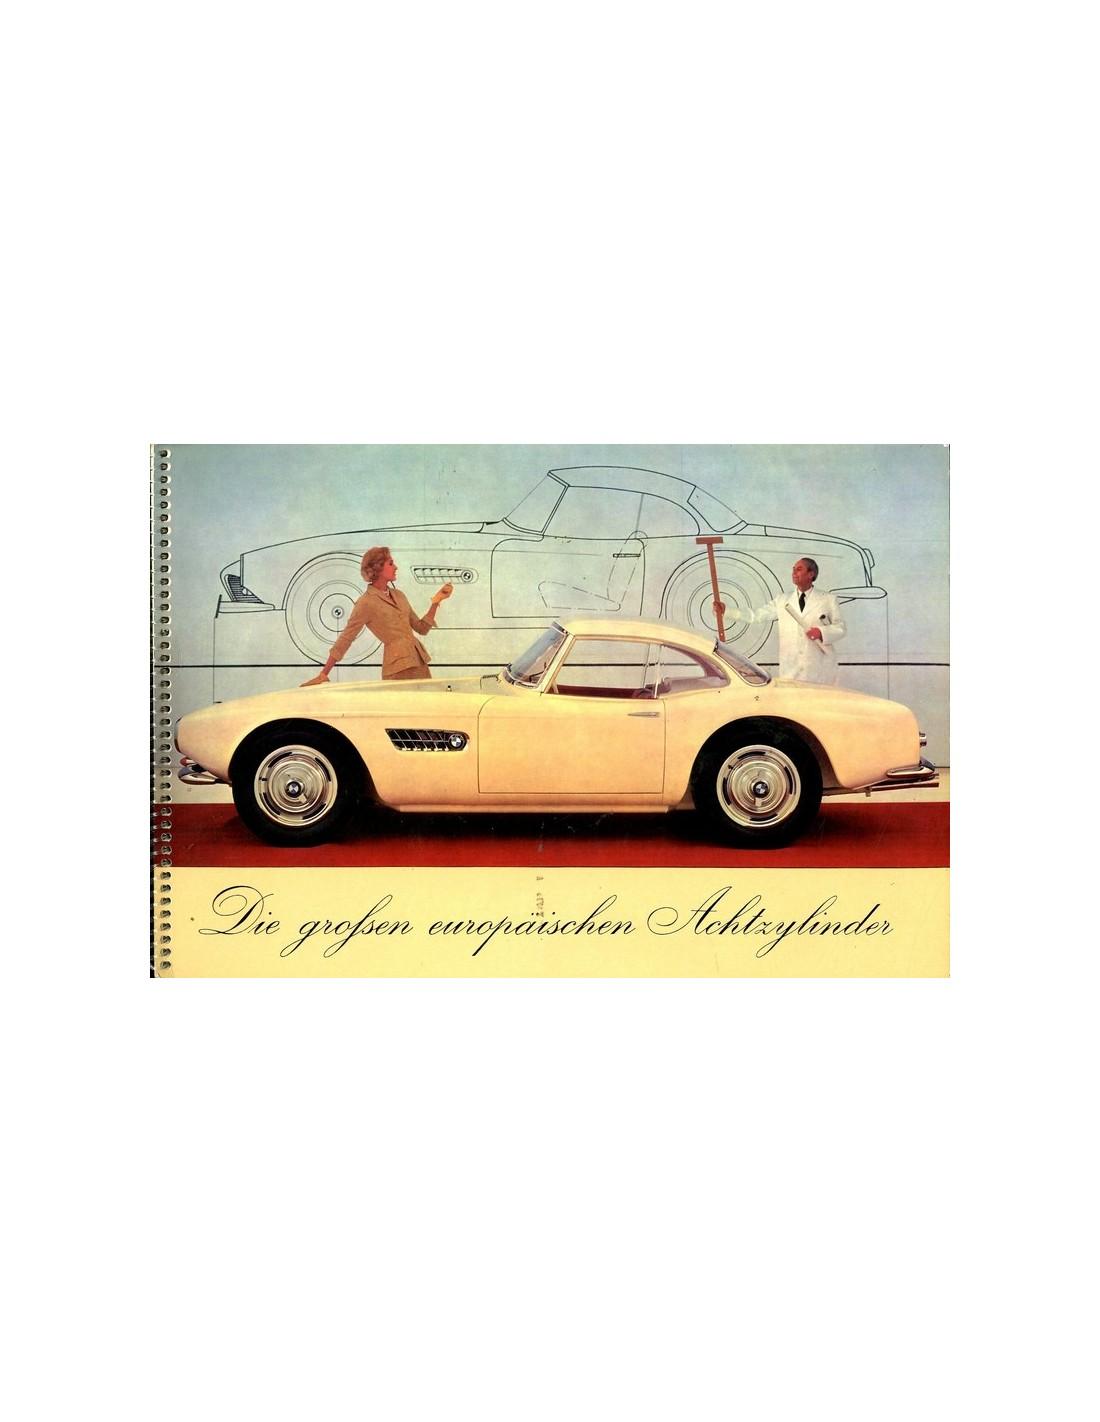 Bmw Z3 Brochure: 1957 BMW 502 503 507 V8 BROCHURE GERMAN